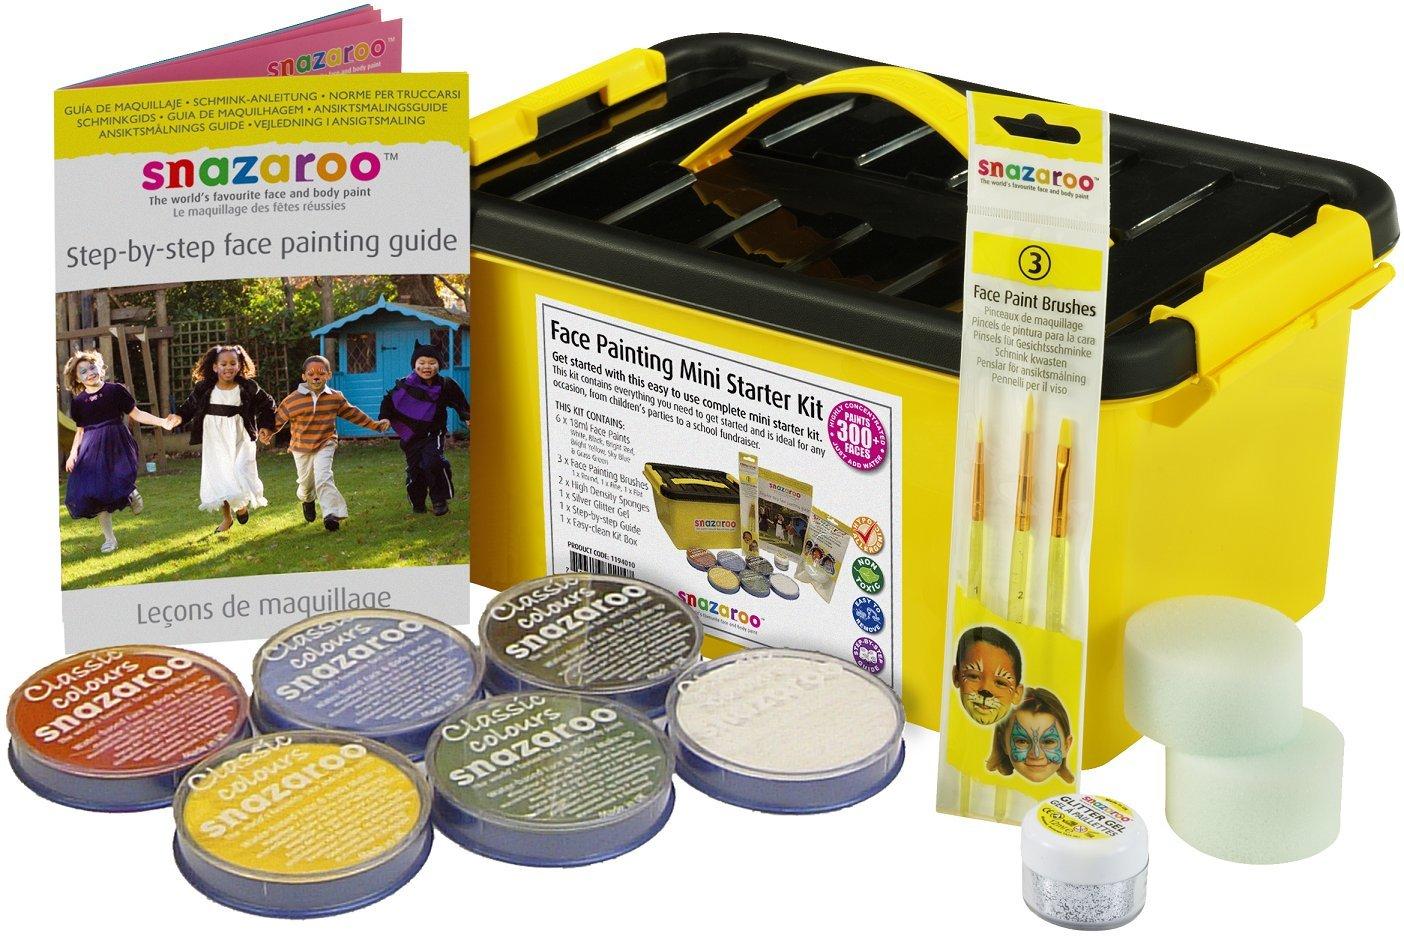 Snazaroo Mini Starter Kit Face and Body Paint, Multicolor